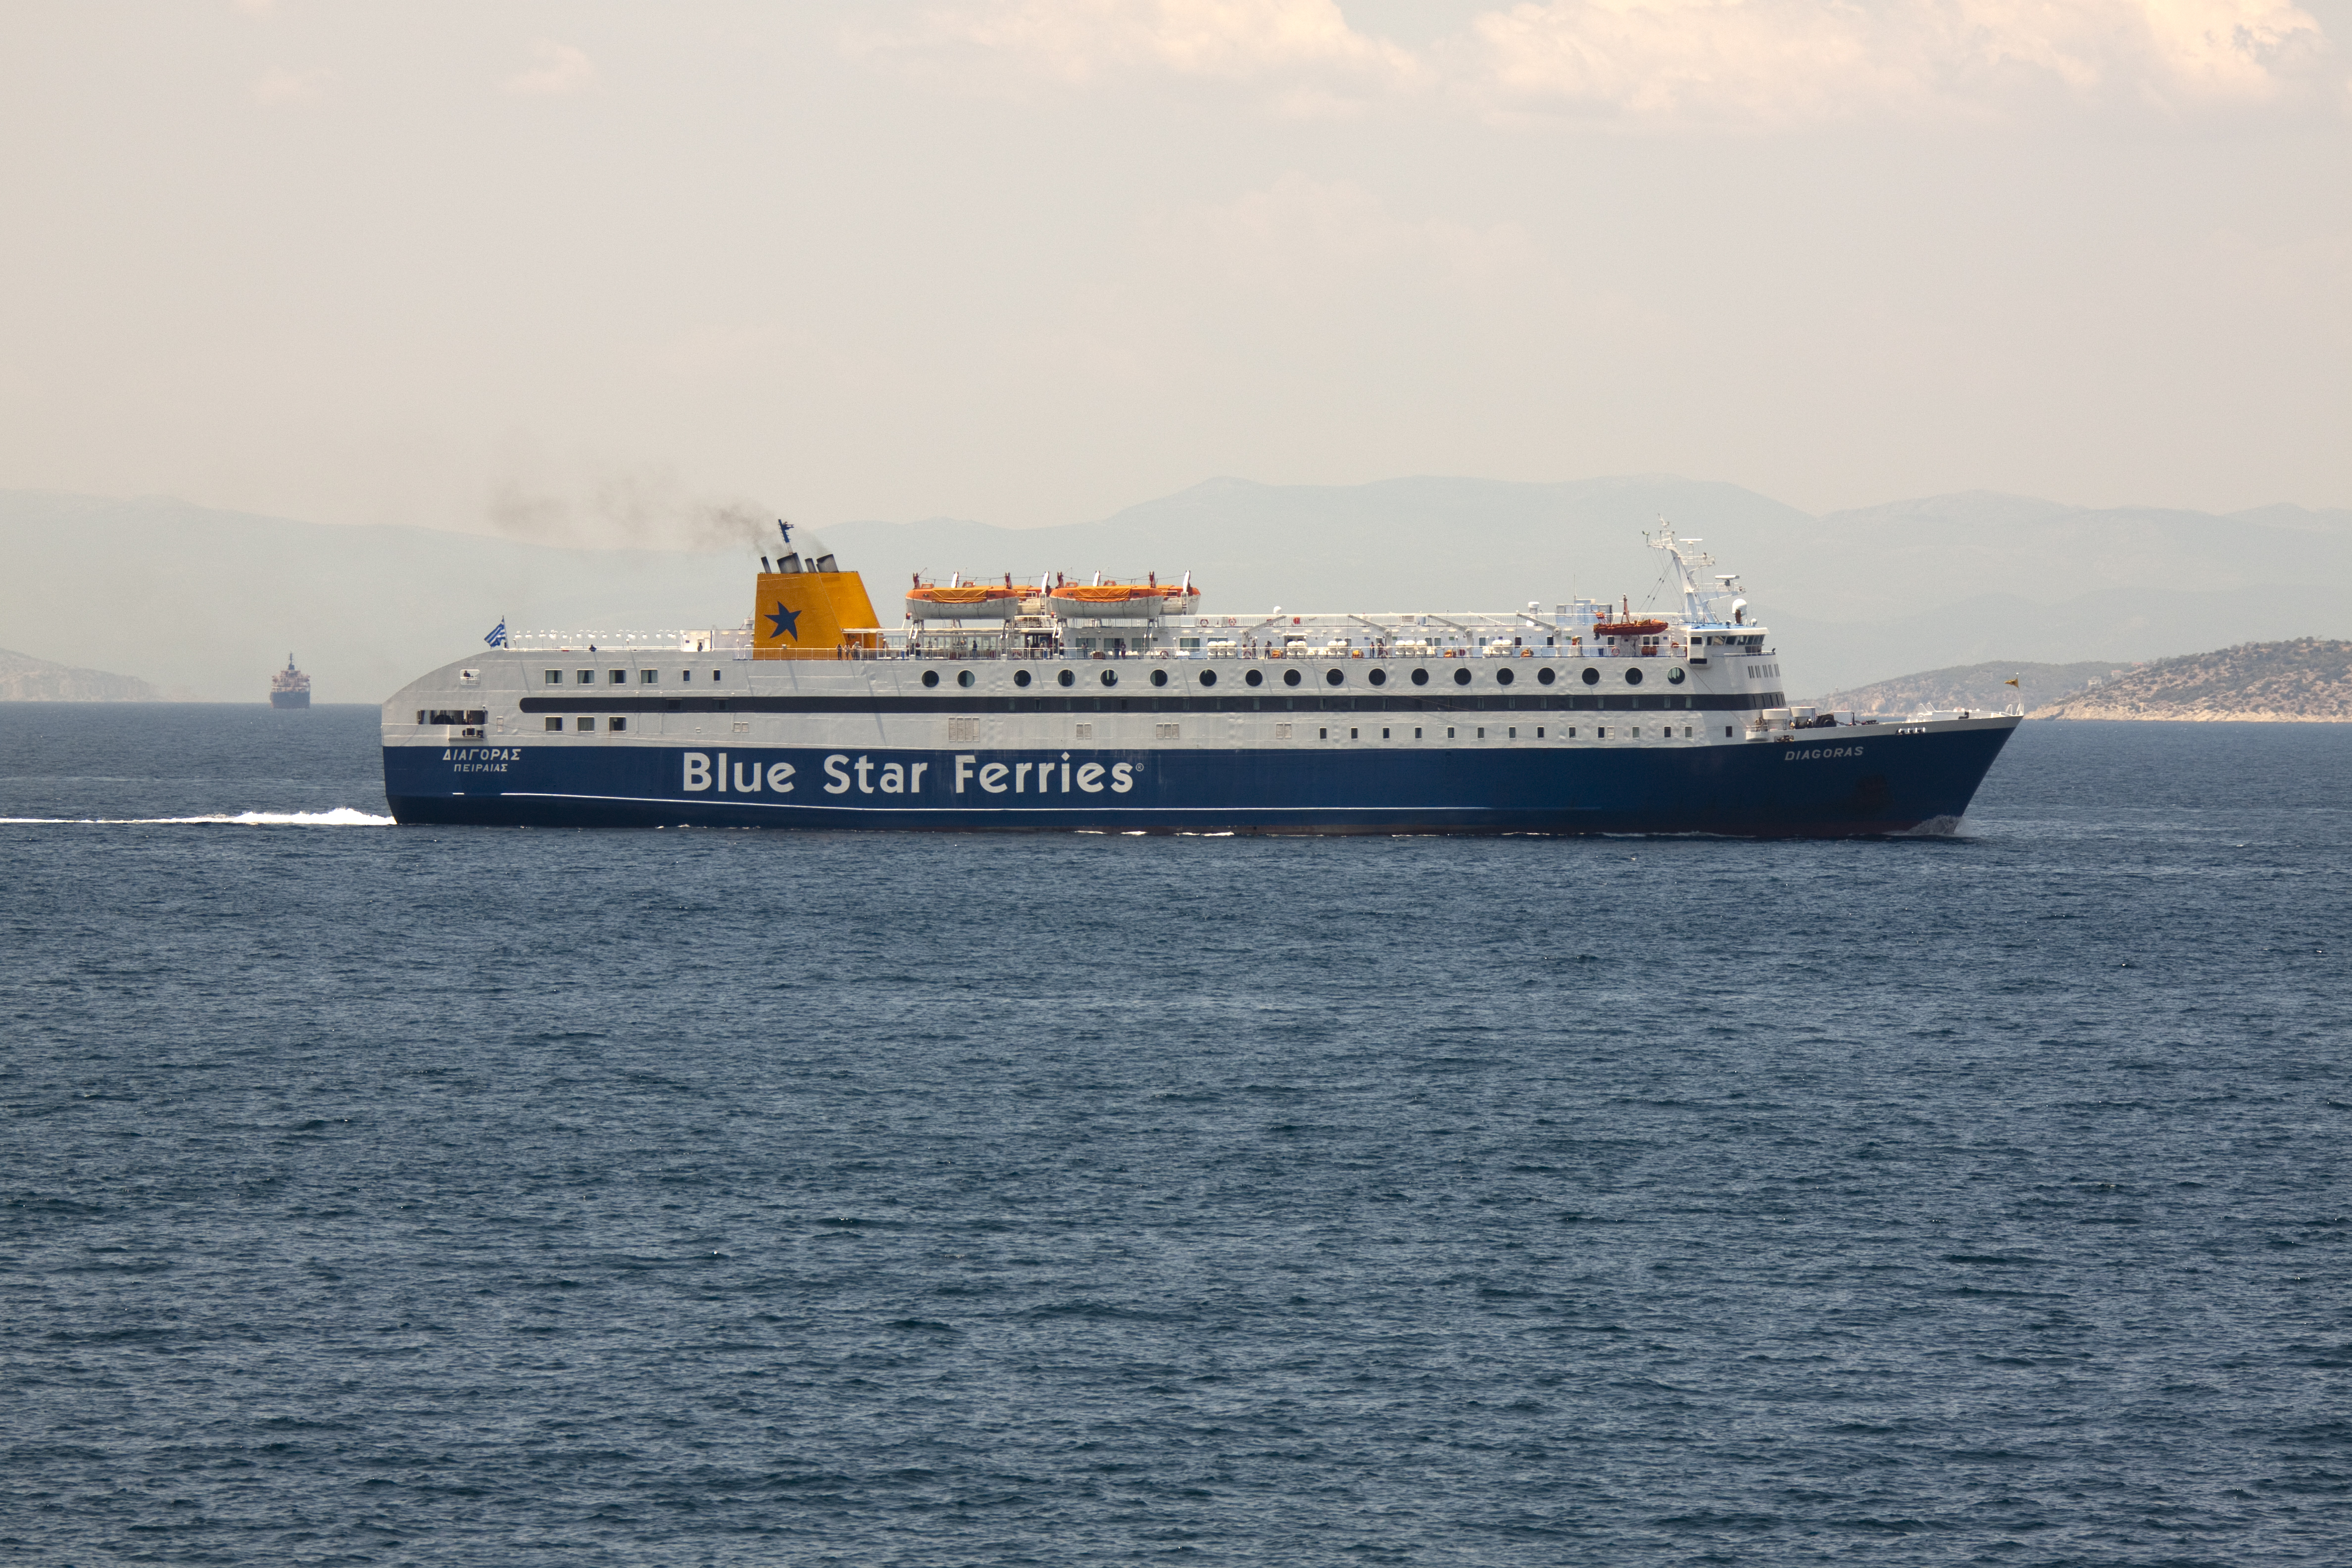 African Moroccan Link: Blue Star Ferries alla conquista dell'Estrecho